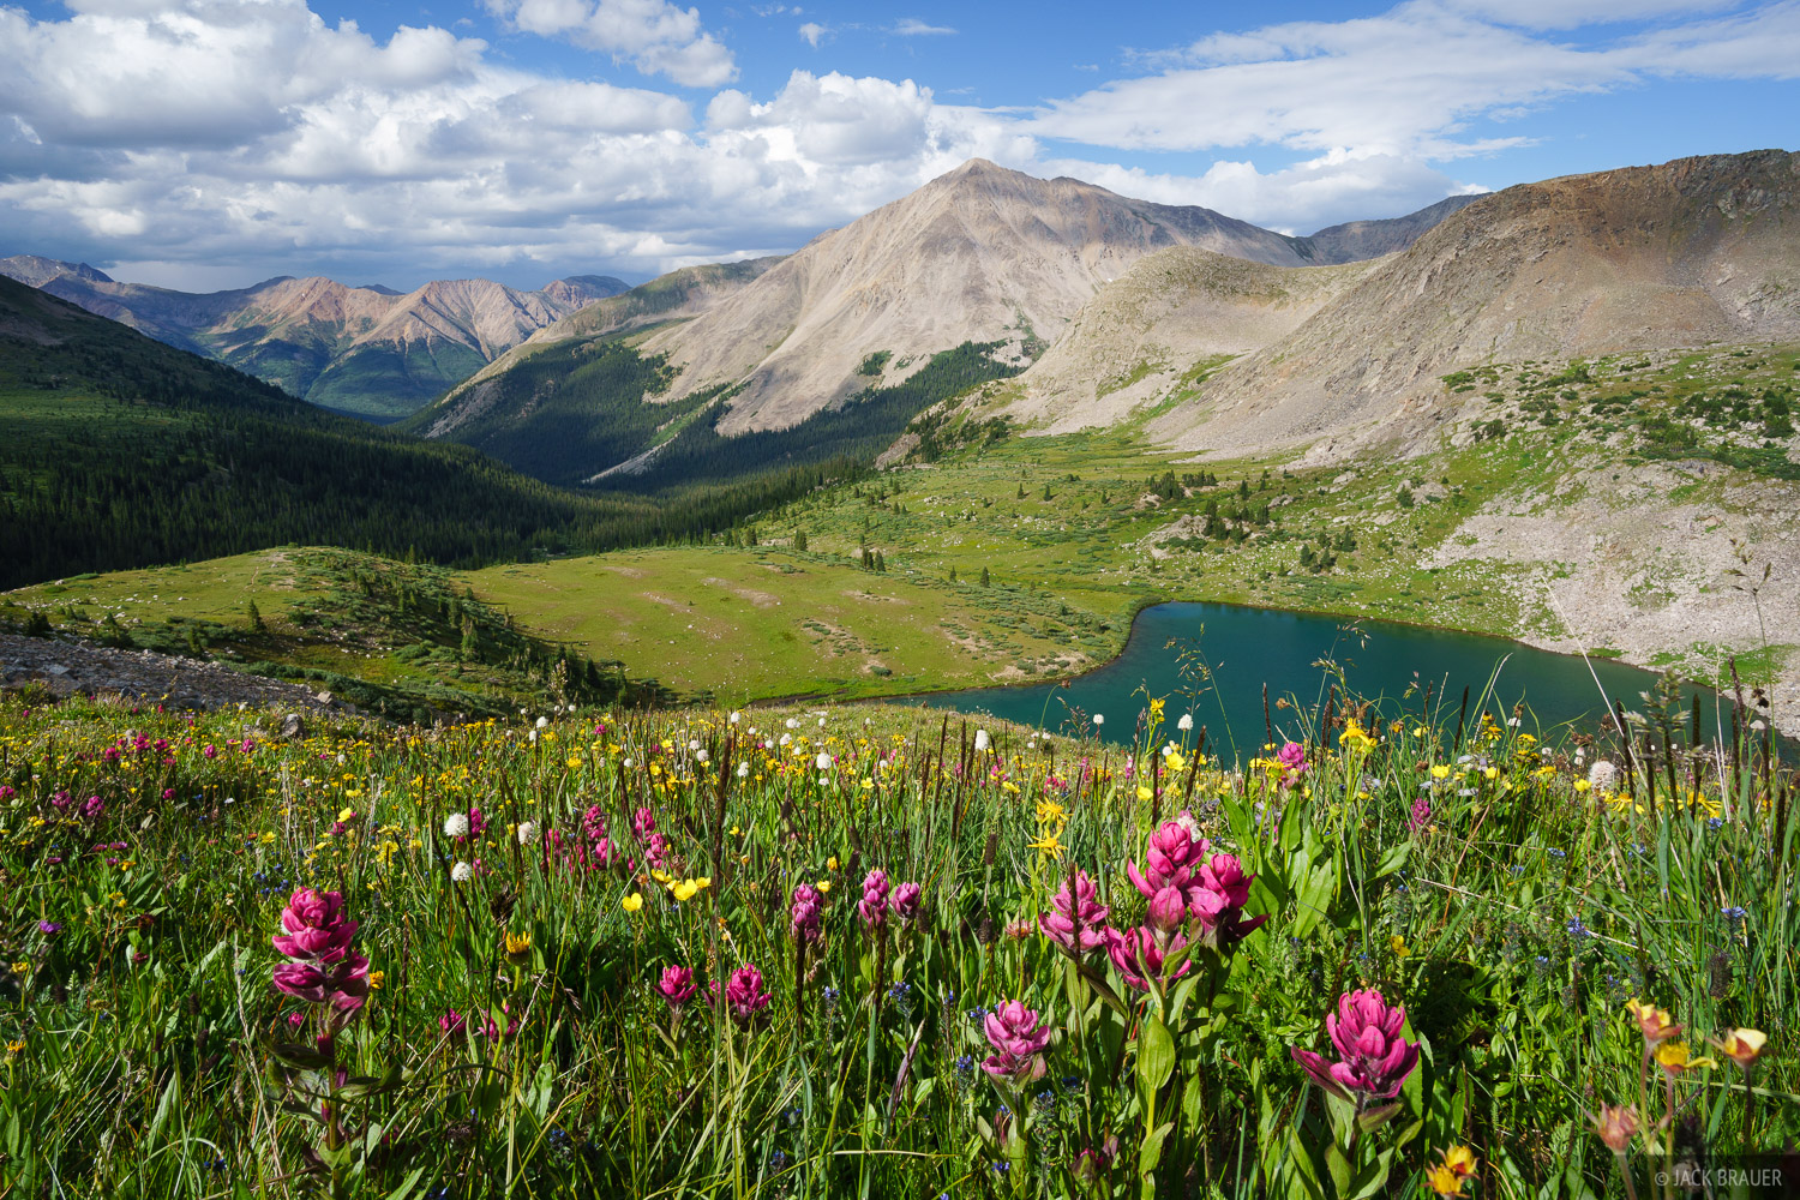 Collegiate Peaks Wilderness, Colorado, Huron Peak, Lake Ann, Sawatch Range, wildflowers, photo